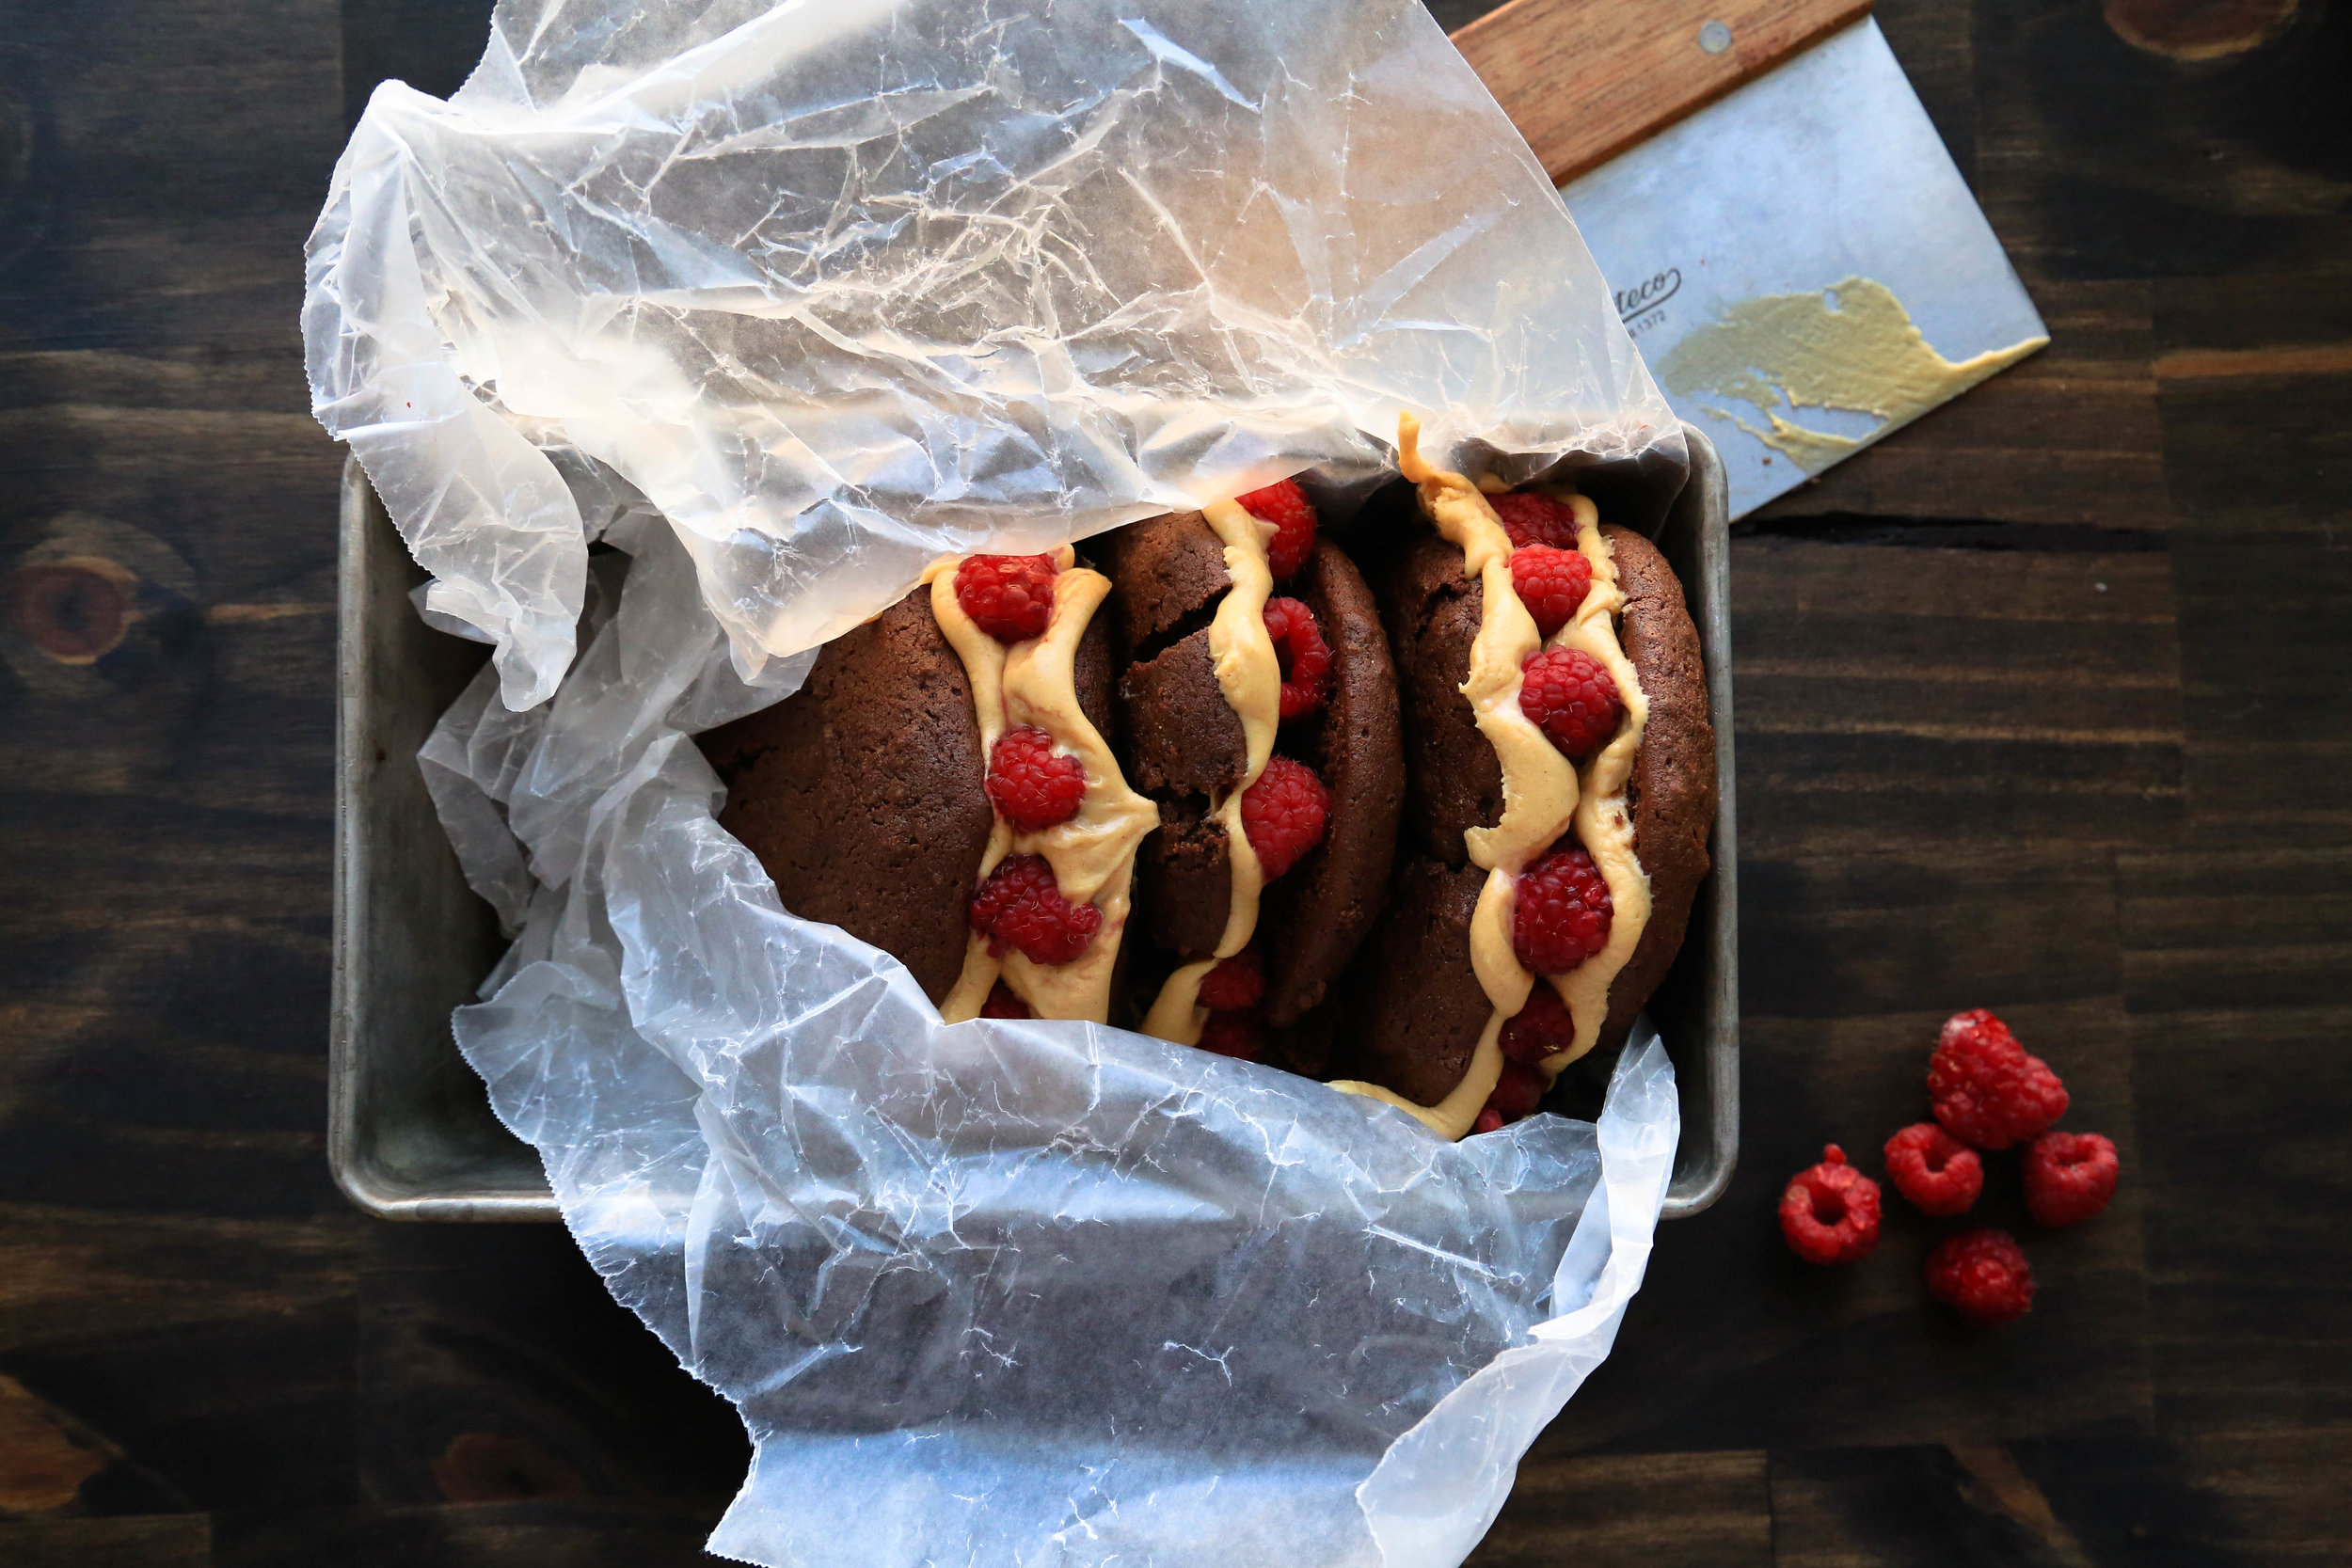 chocolate_sandwiches_frontpaige_04.jpg